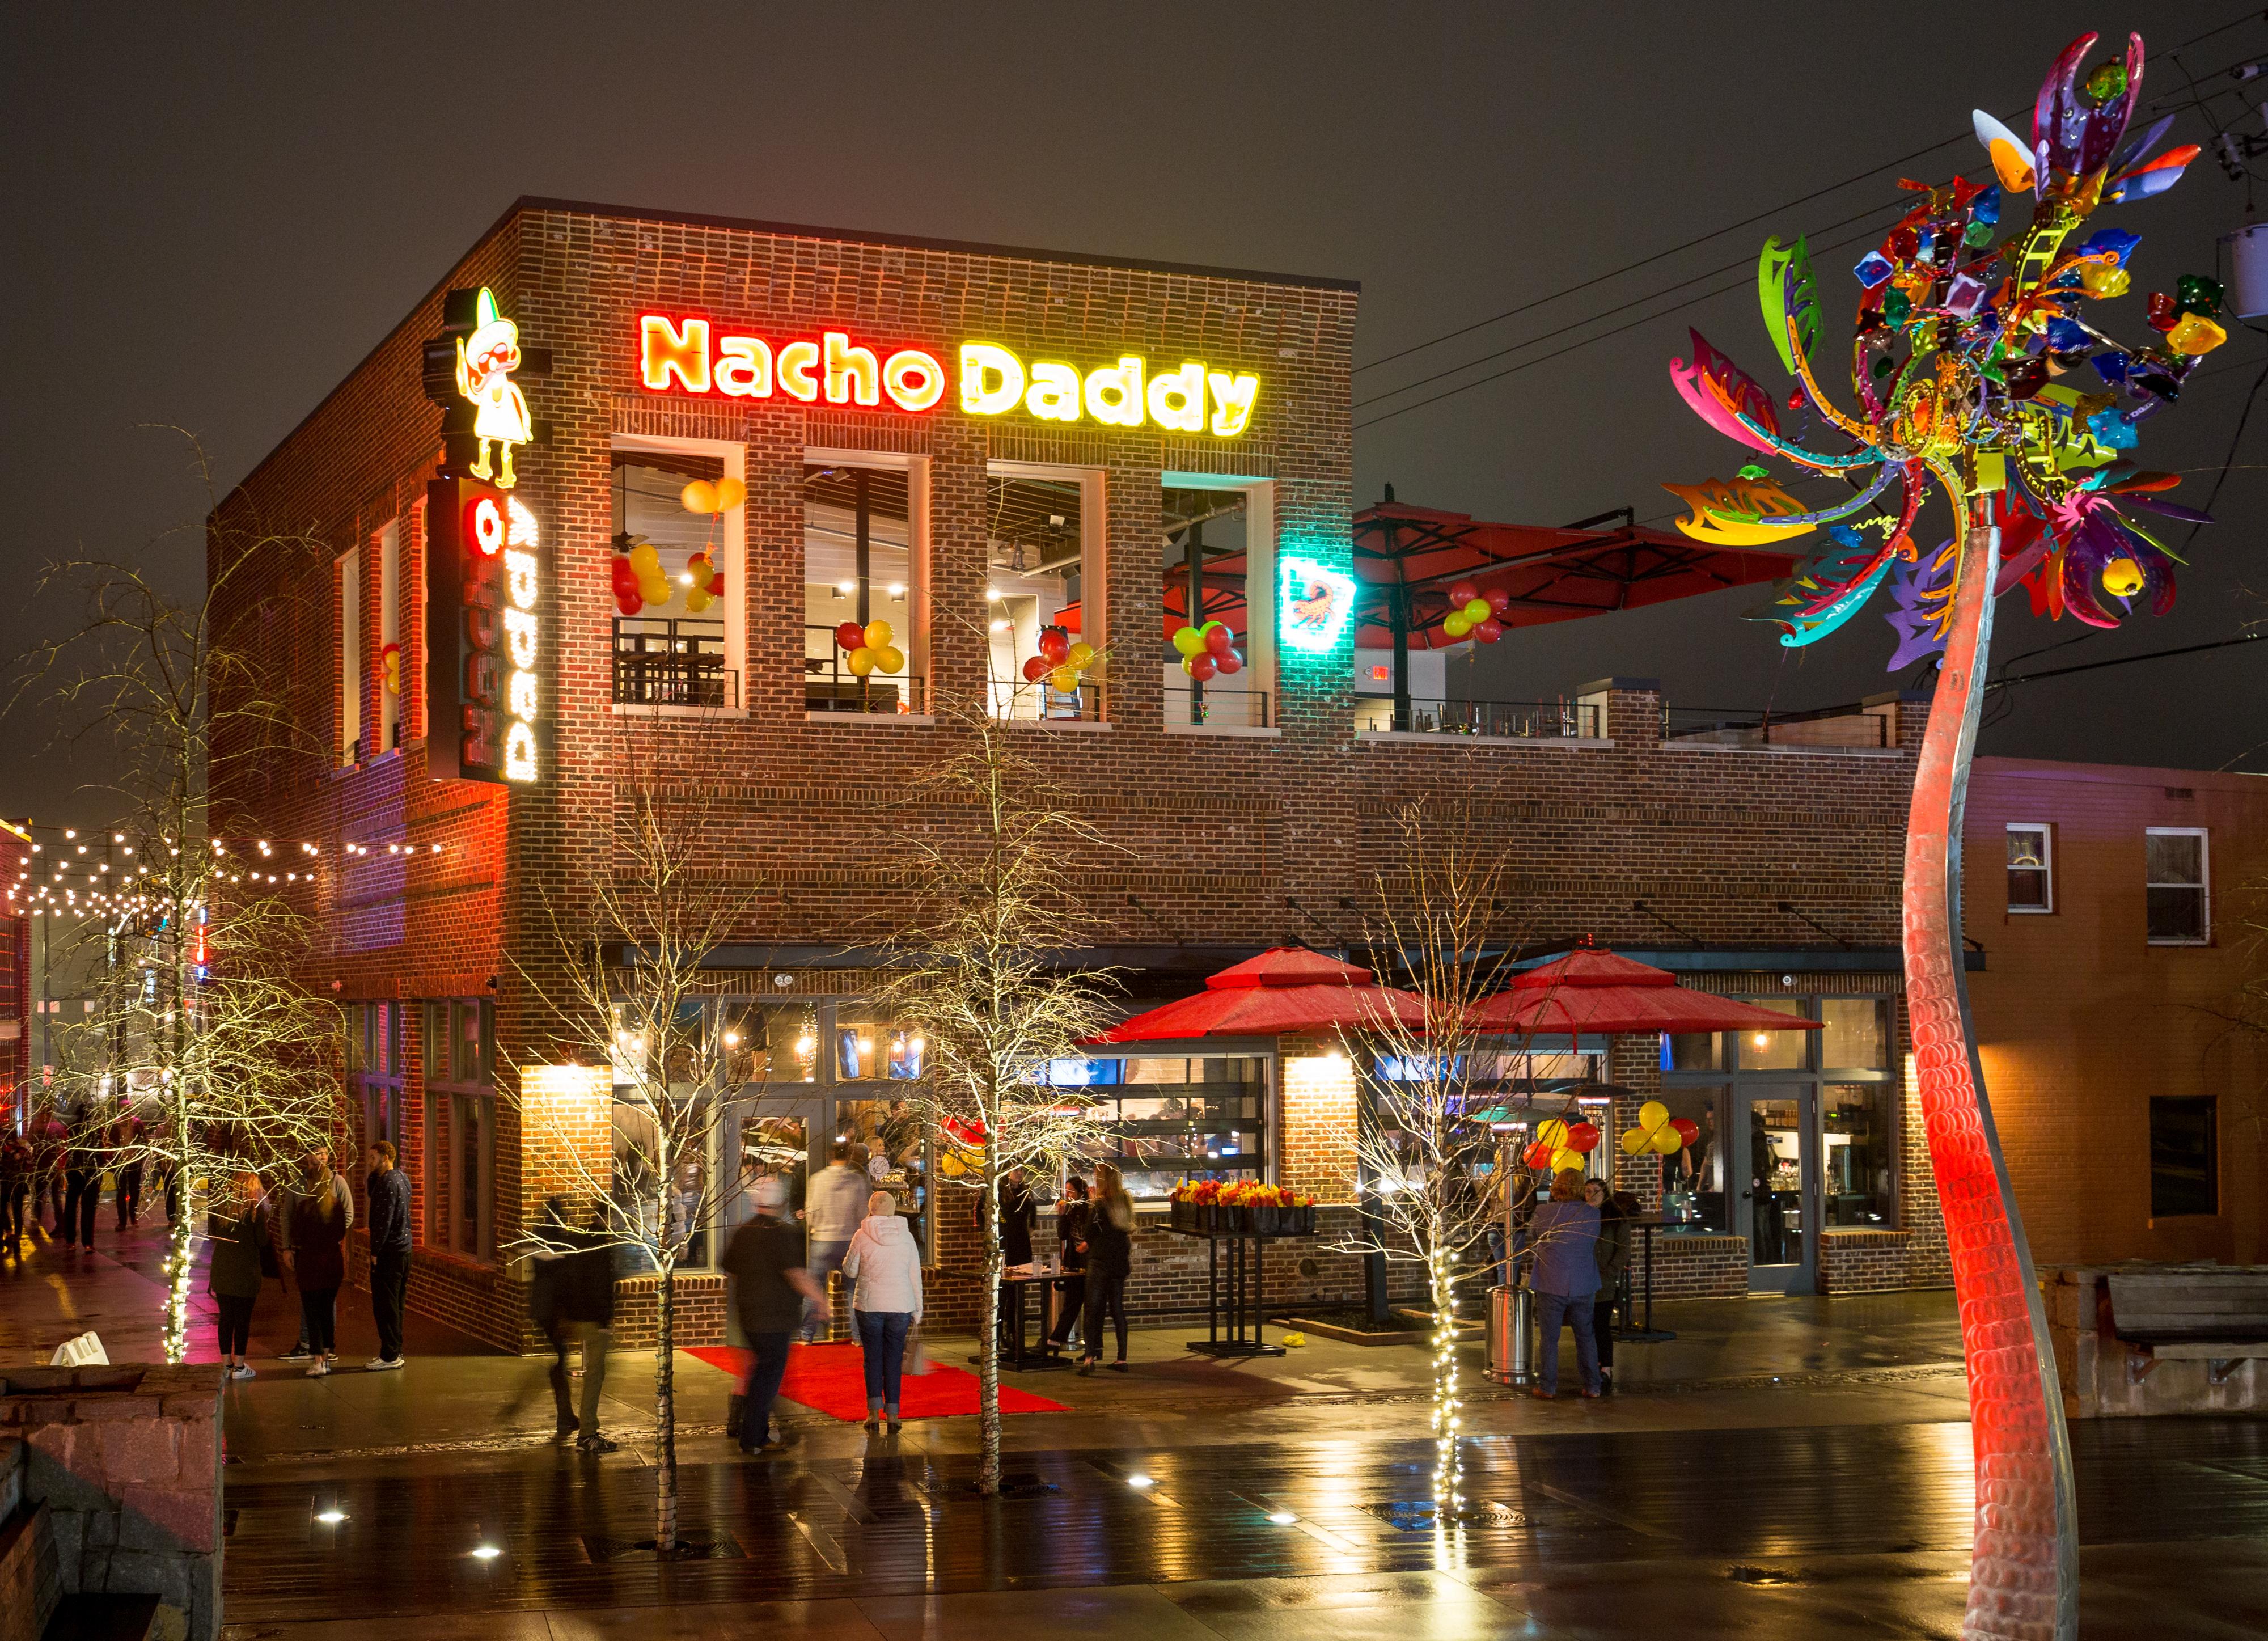 Nacho Daddy Exterior (2)